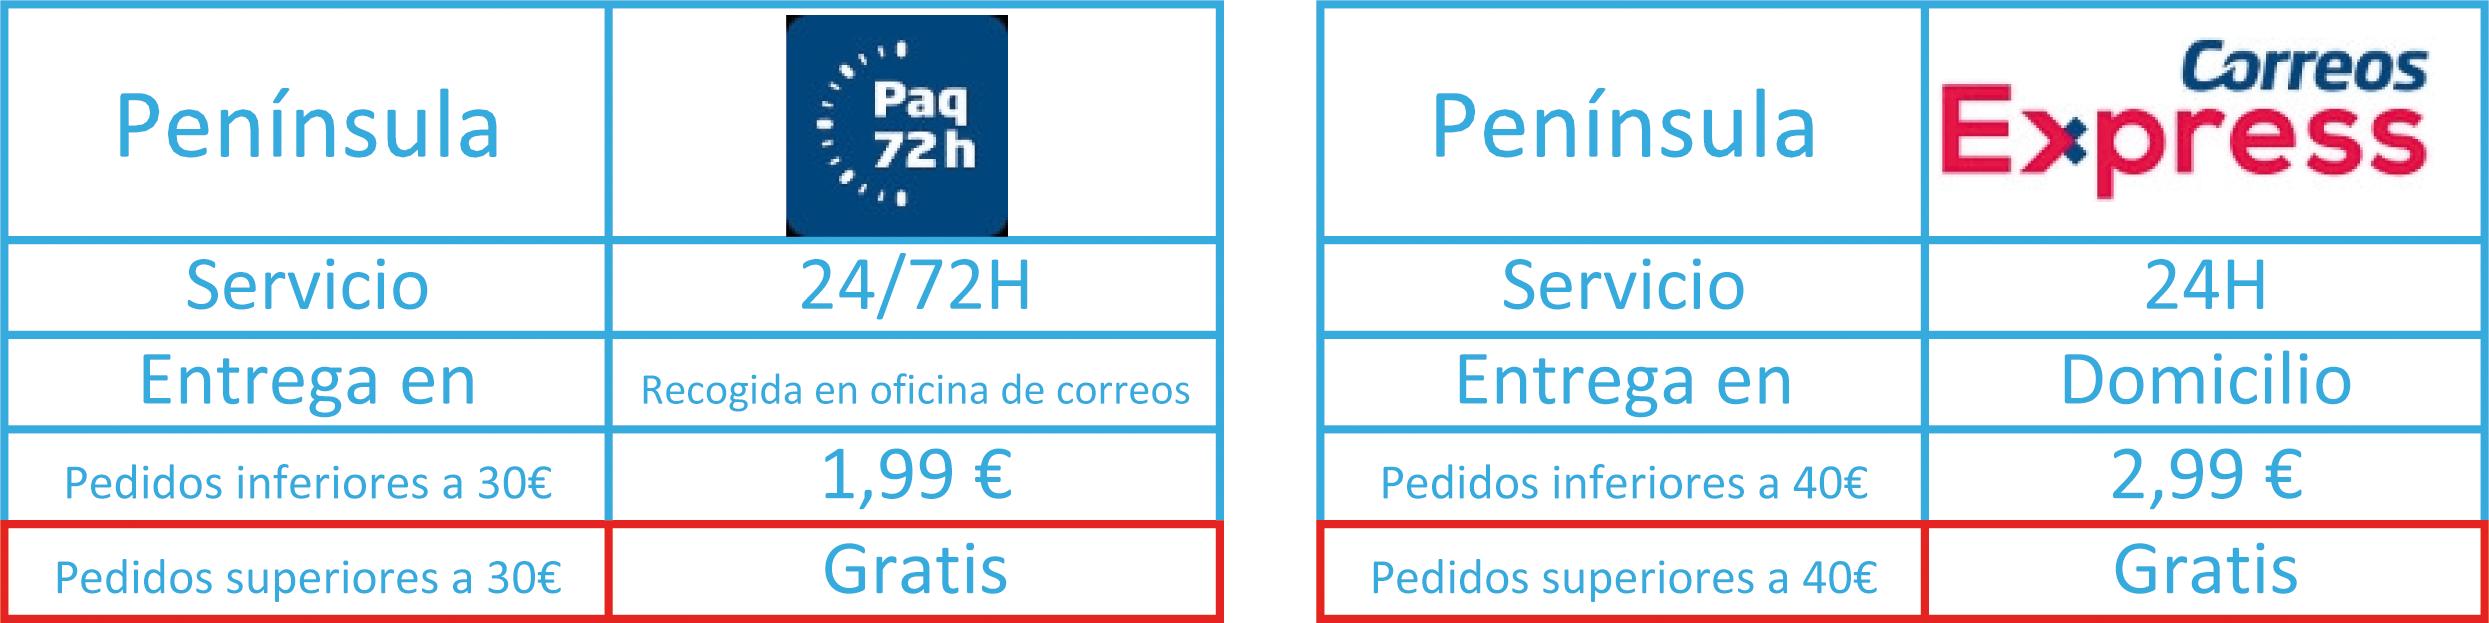 península gastos de envío